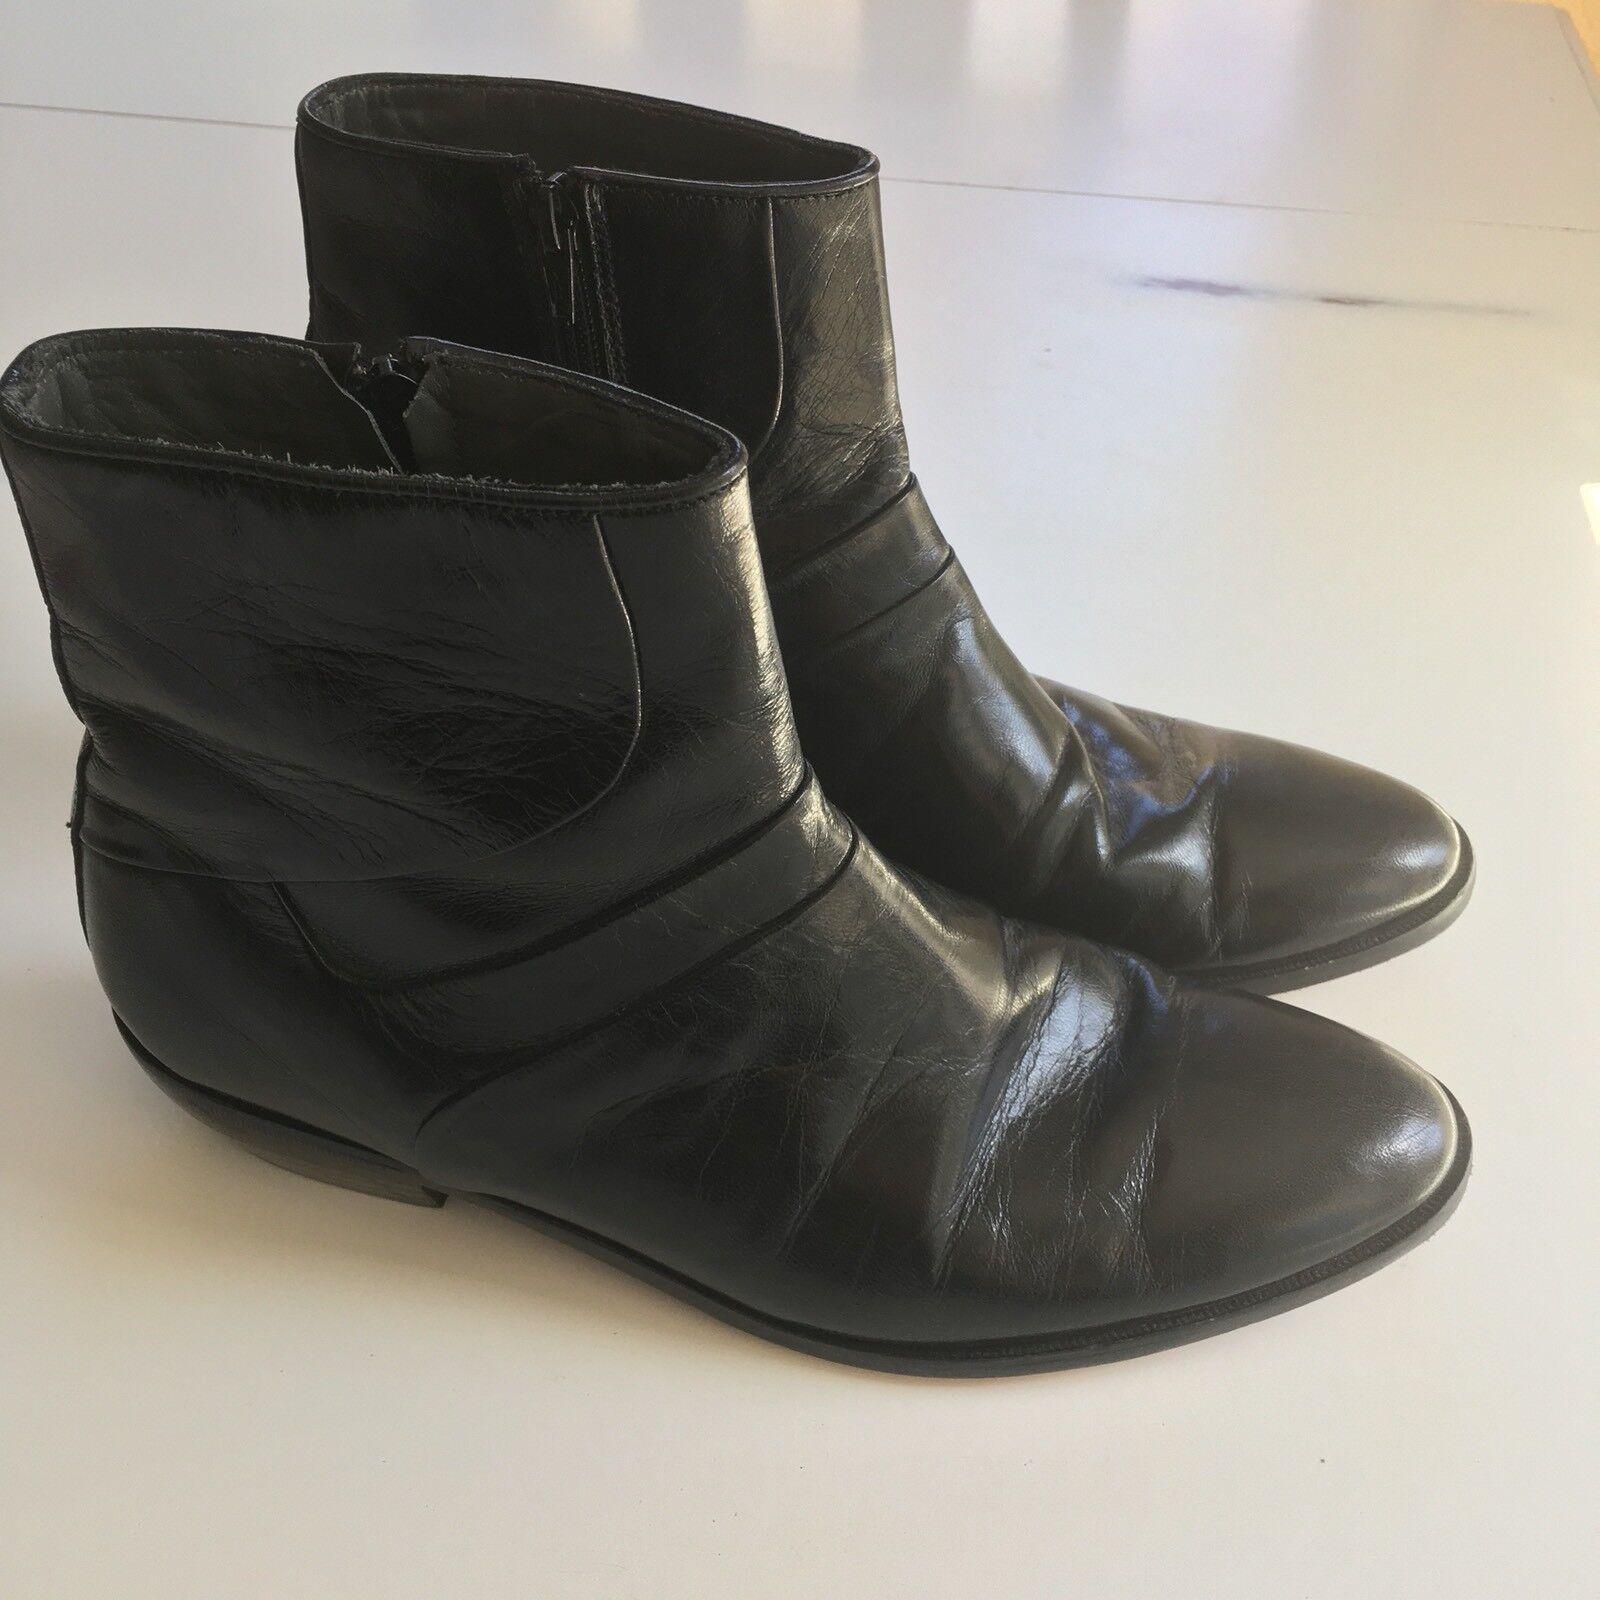 David Taylor Fine Leather Side Zipper Ankle Boots Excellent Condition 9.5 D